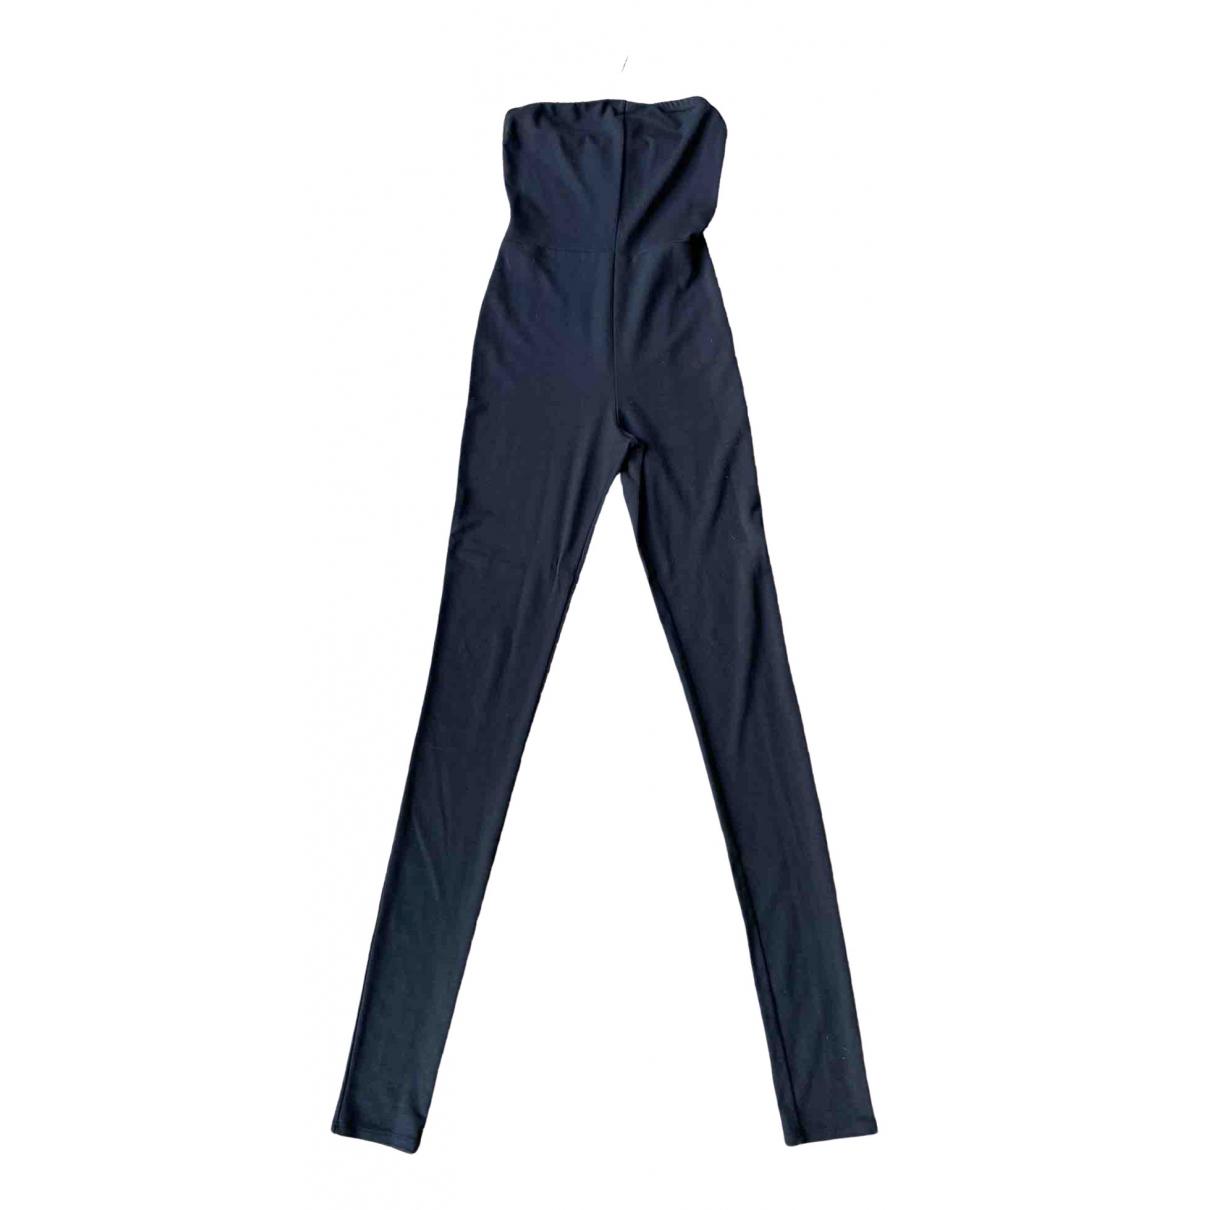 Maison Martin Margiela \N Black jumpsuit for Women 40 IT